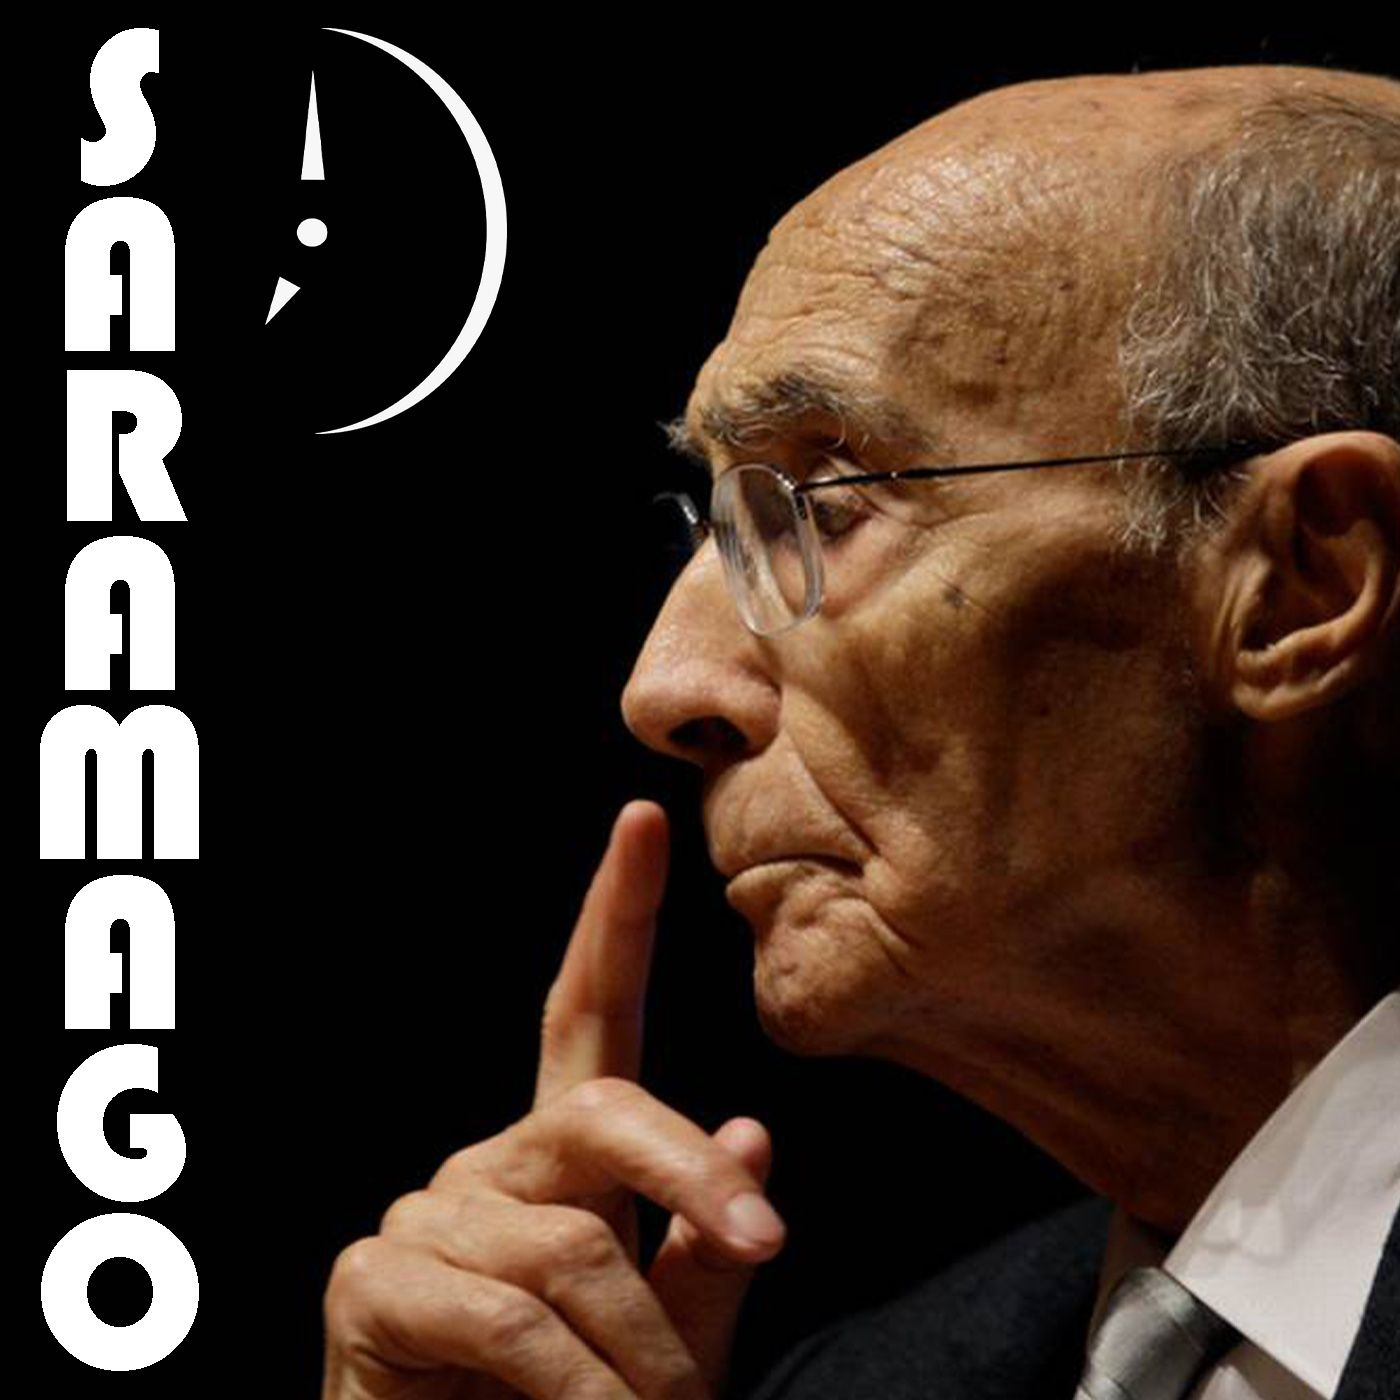 Monografia su SARAMAGO